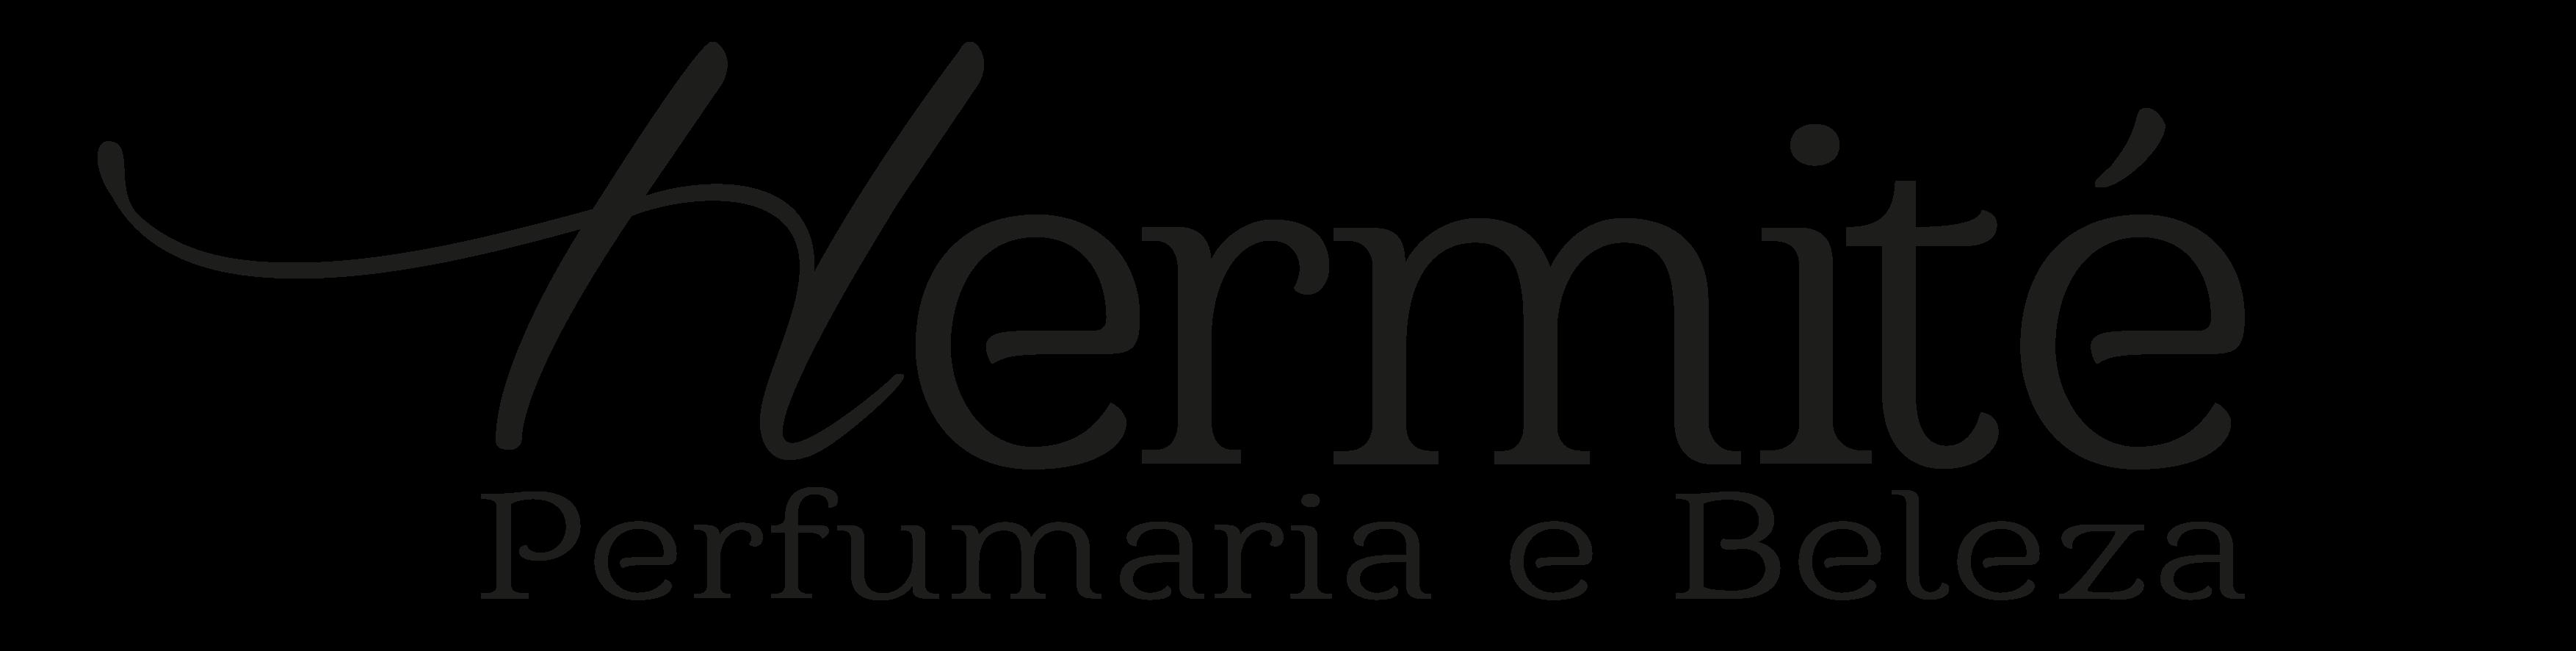 HERMITÉ PERFUMES